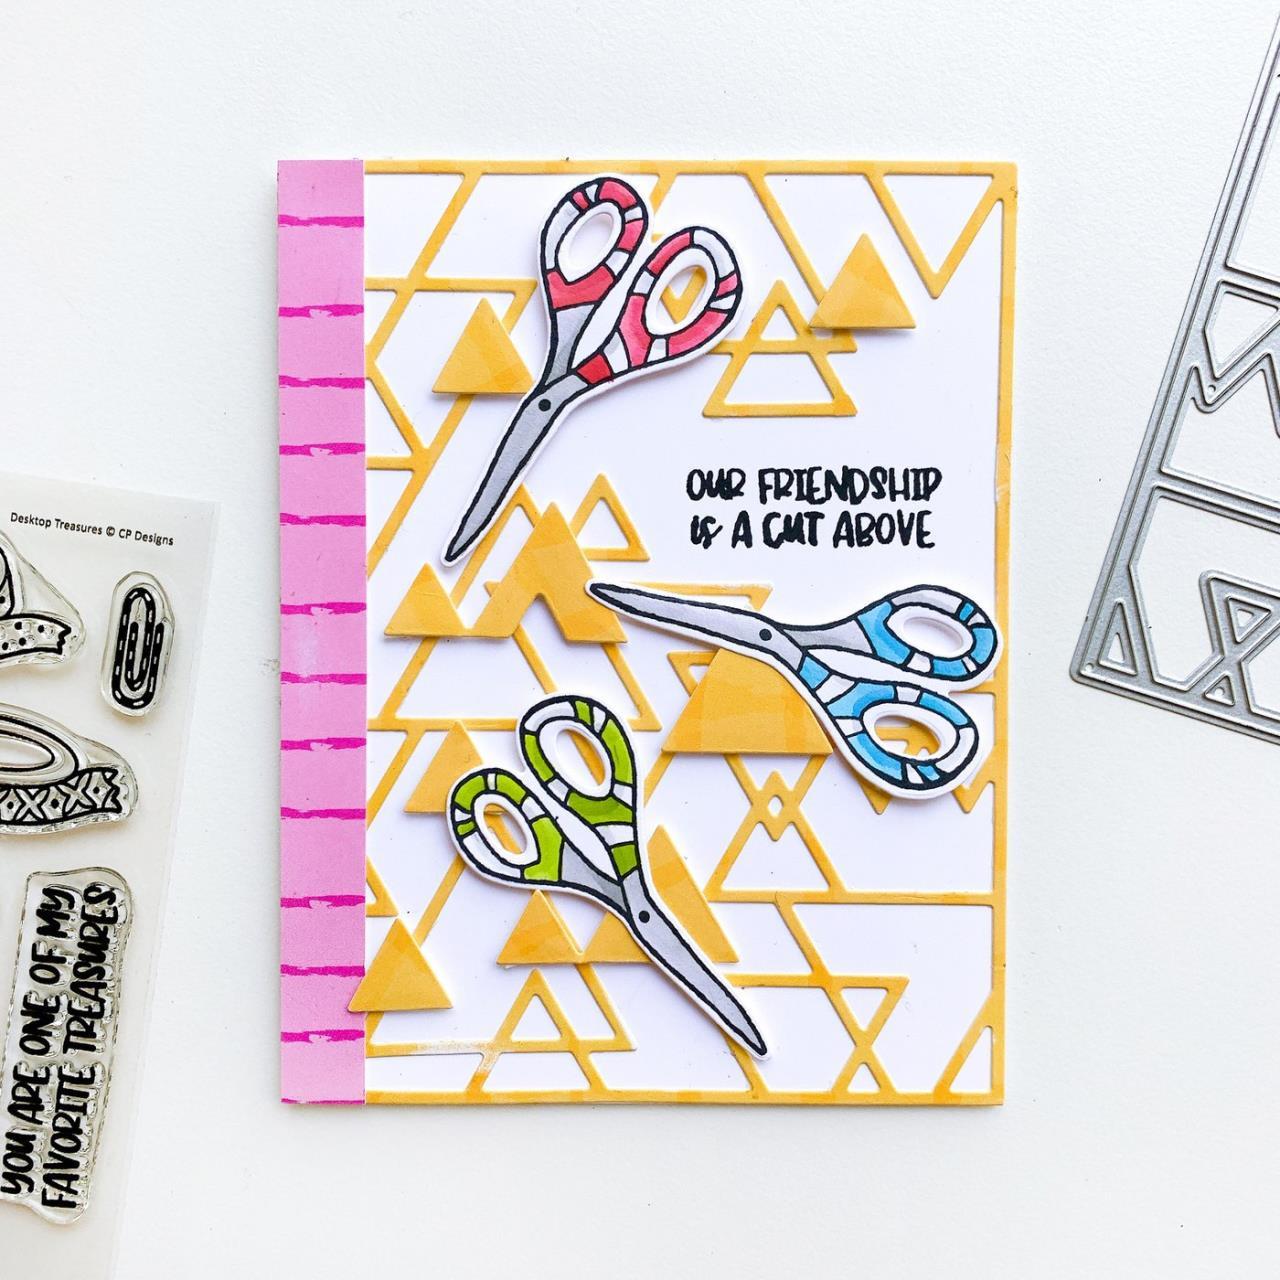 Desktop Treasures, Catherine Pooler Clear Stamps -